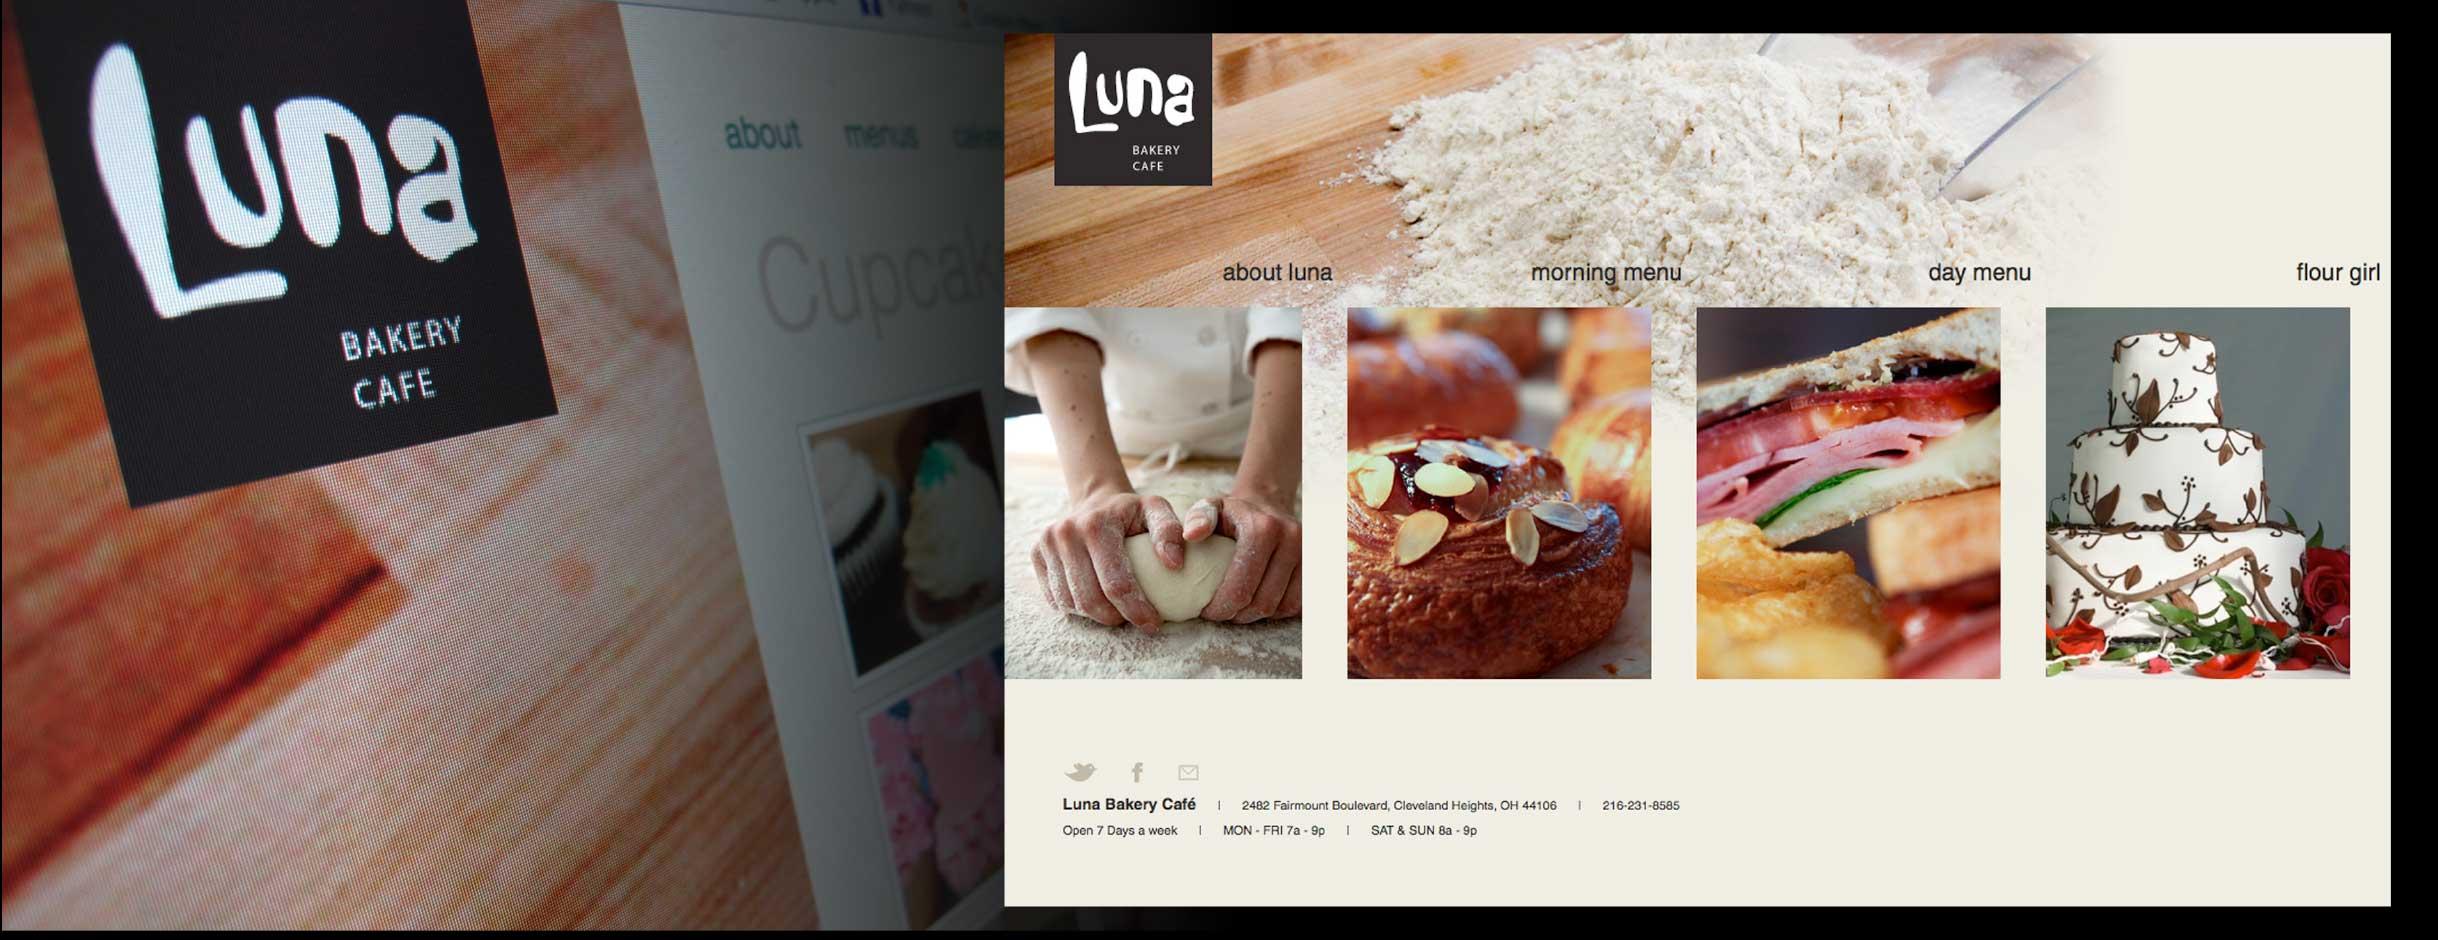 Luna Bakery